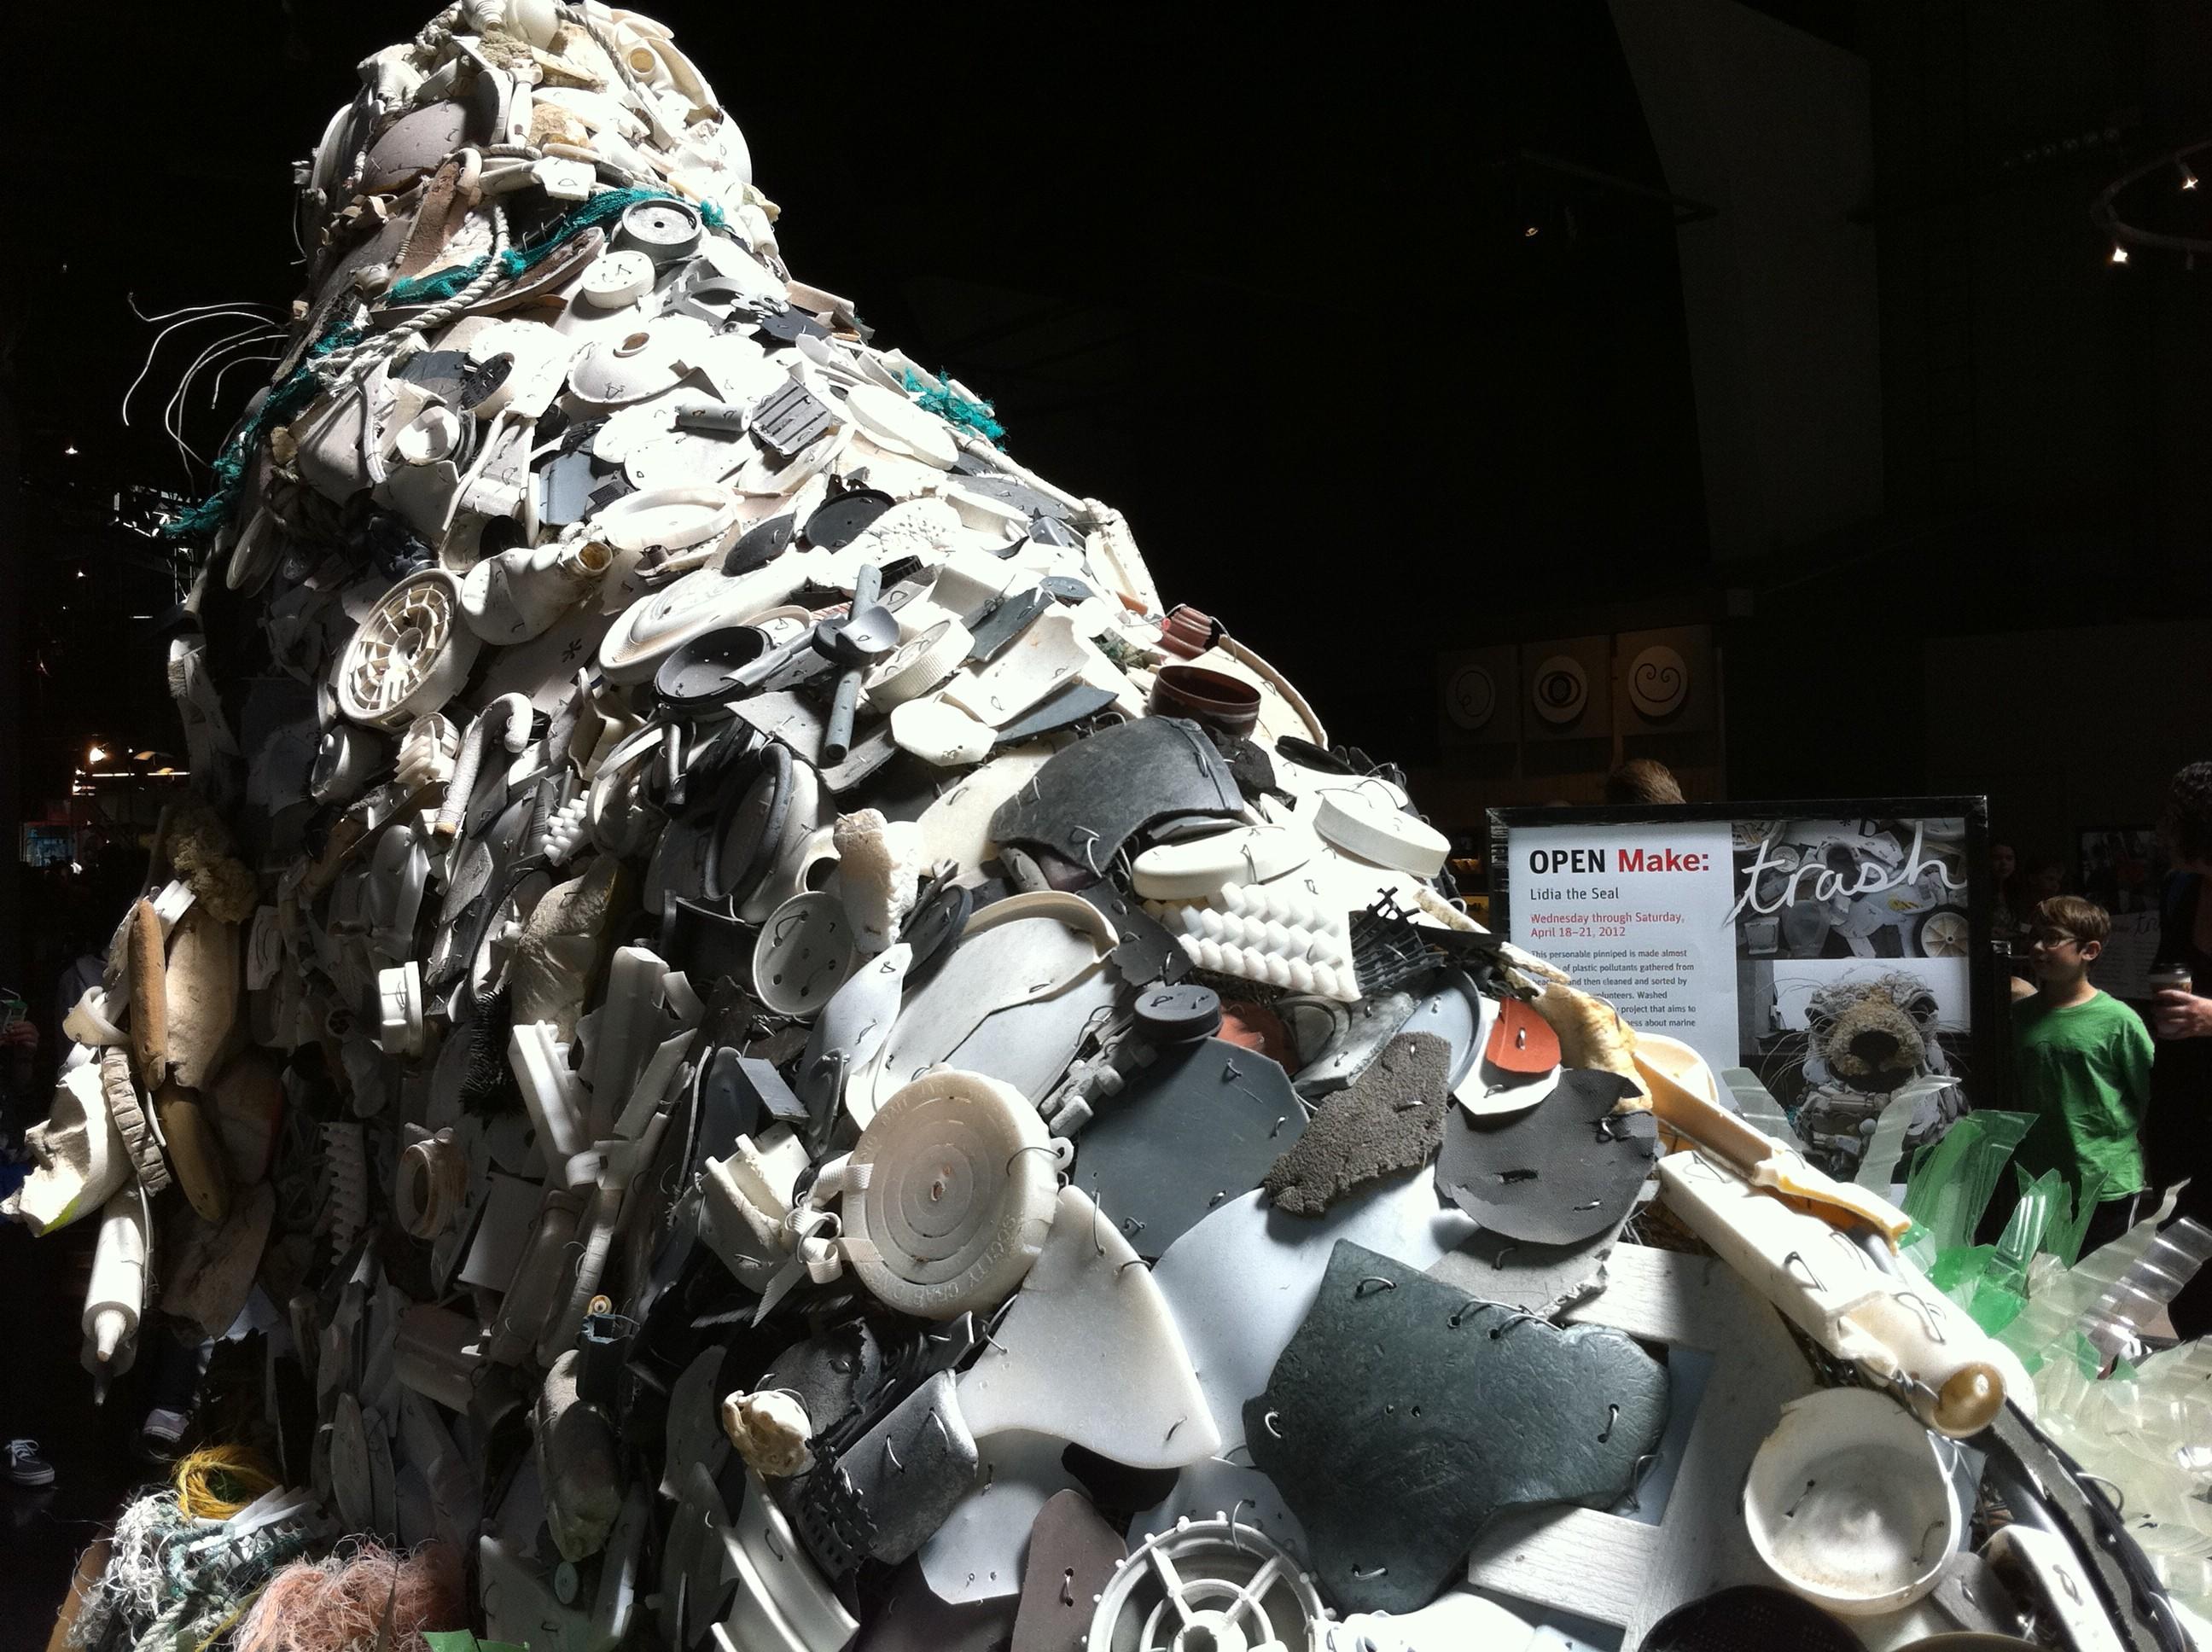 Open MAKE: Celebrating Trash at the Exploratorium